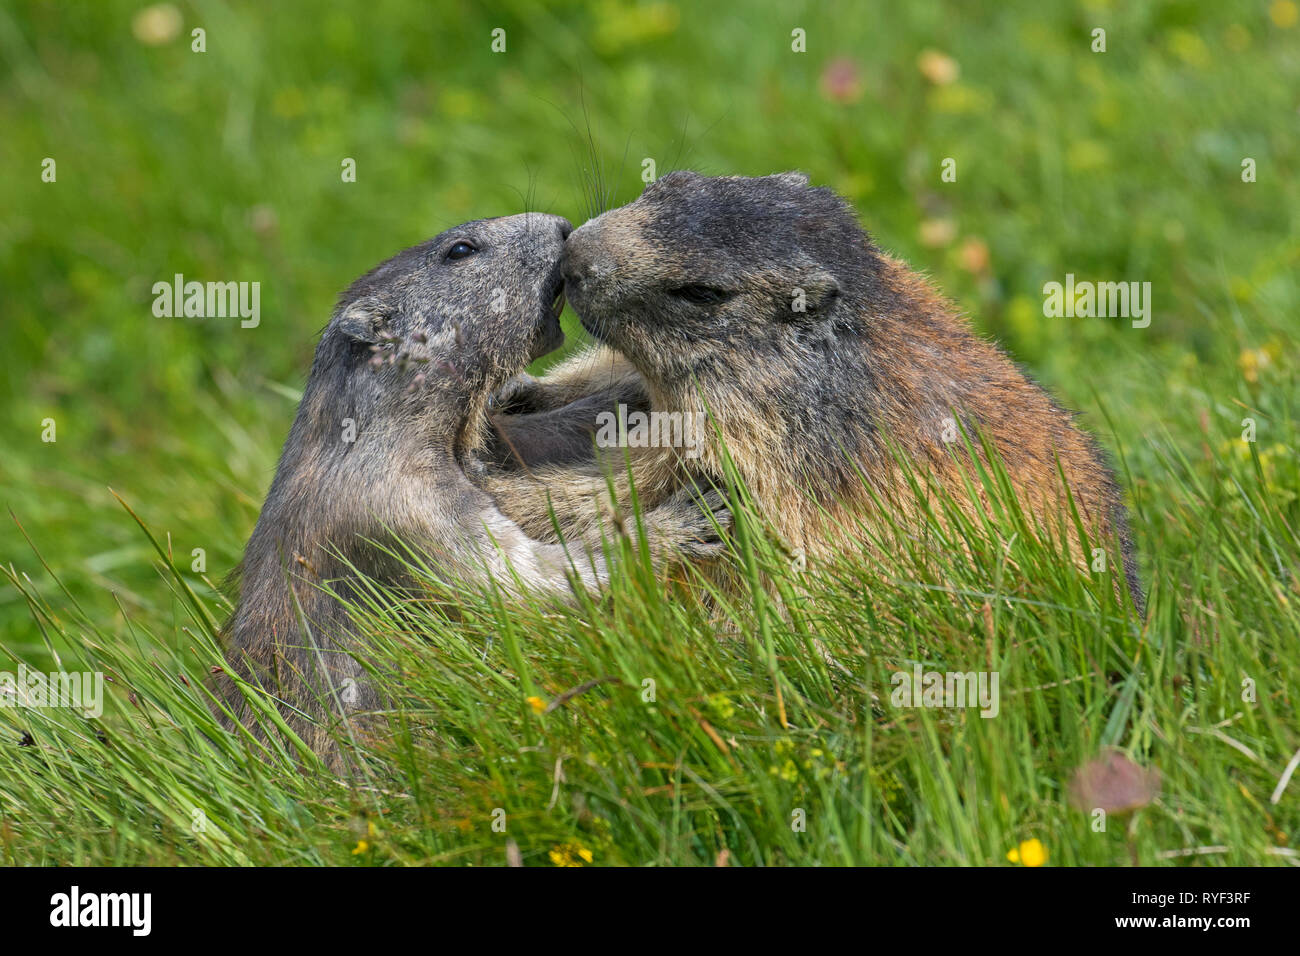 Alpine marmot (Marmota marmota) adult playing with young, Hohe Tauern National Park, Carinthia, Austria - Stock Image